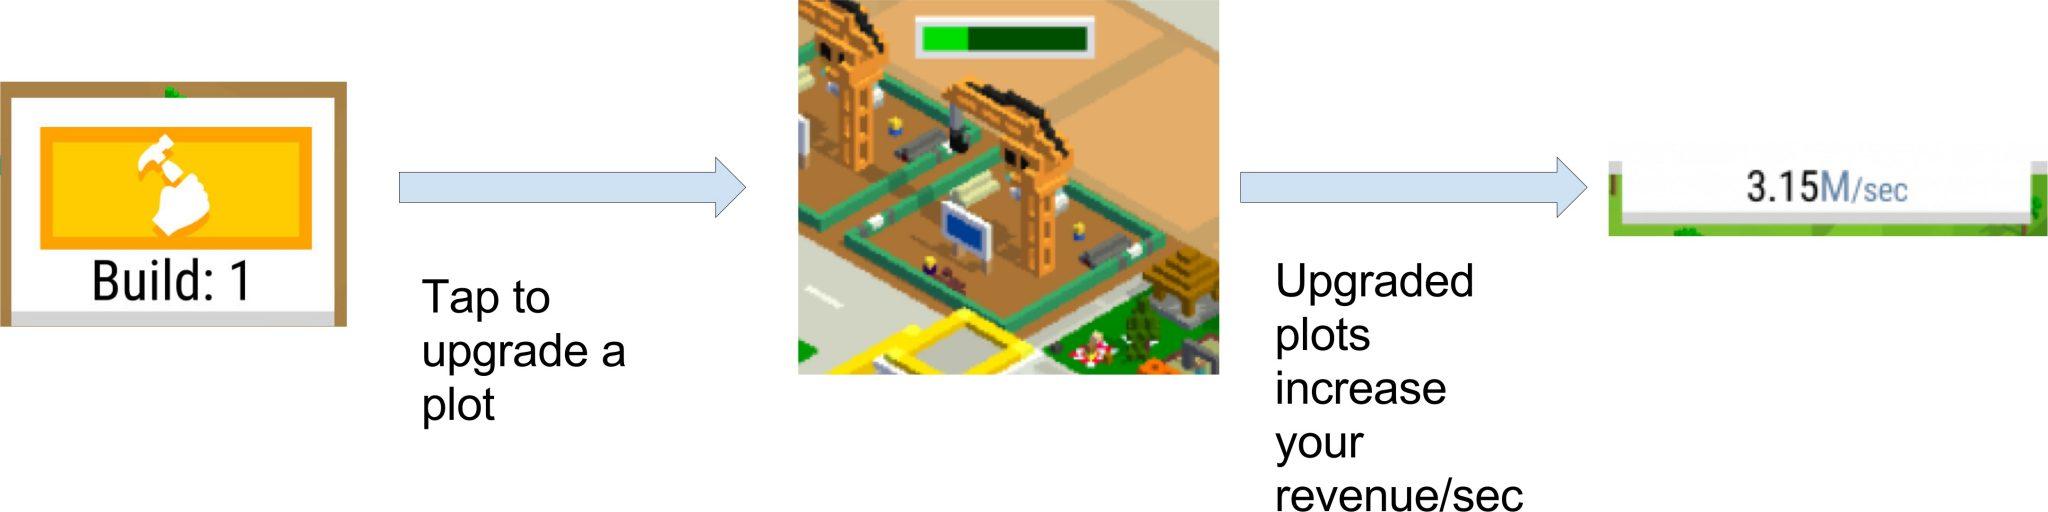 Core Interaction of Bit City